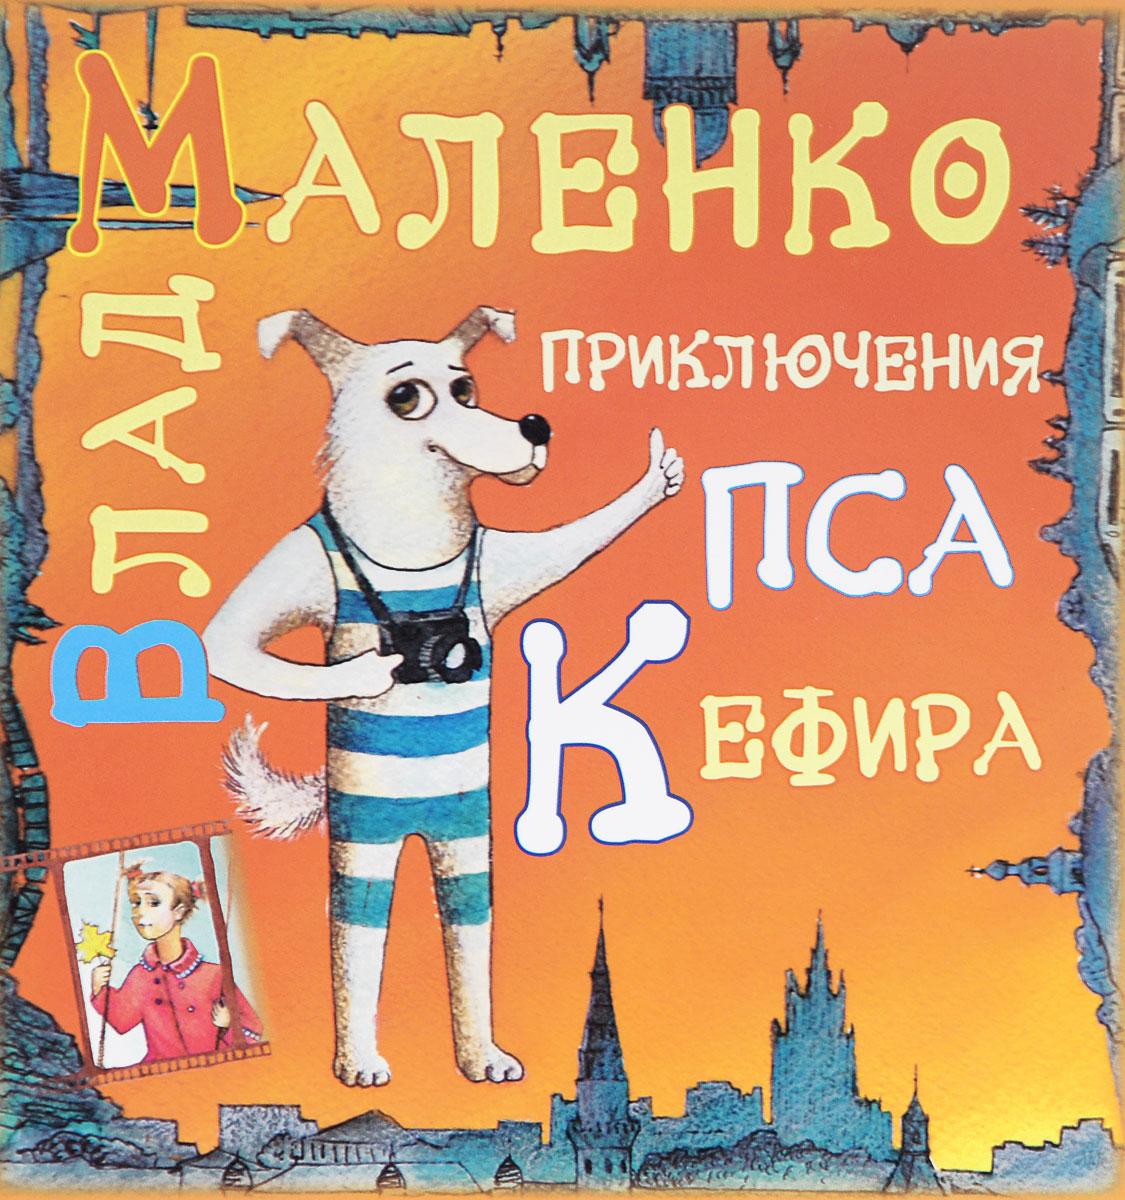 Влад Маленко Приключения пса Кефира